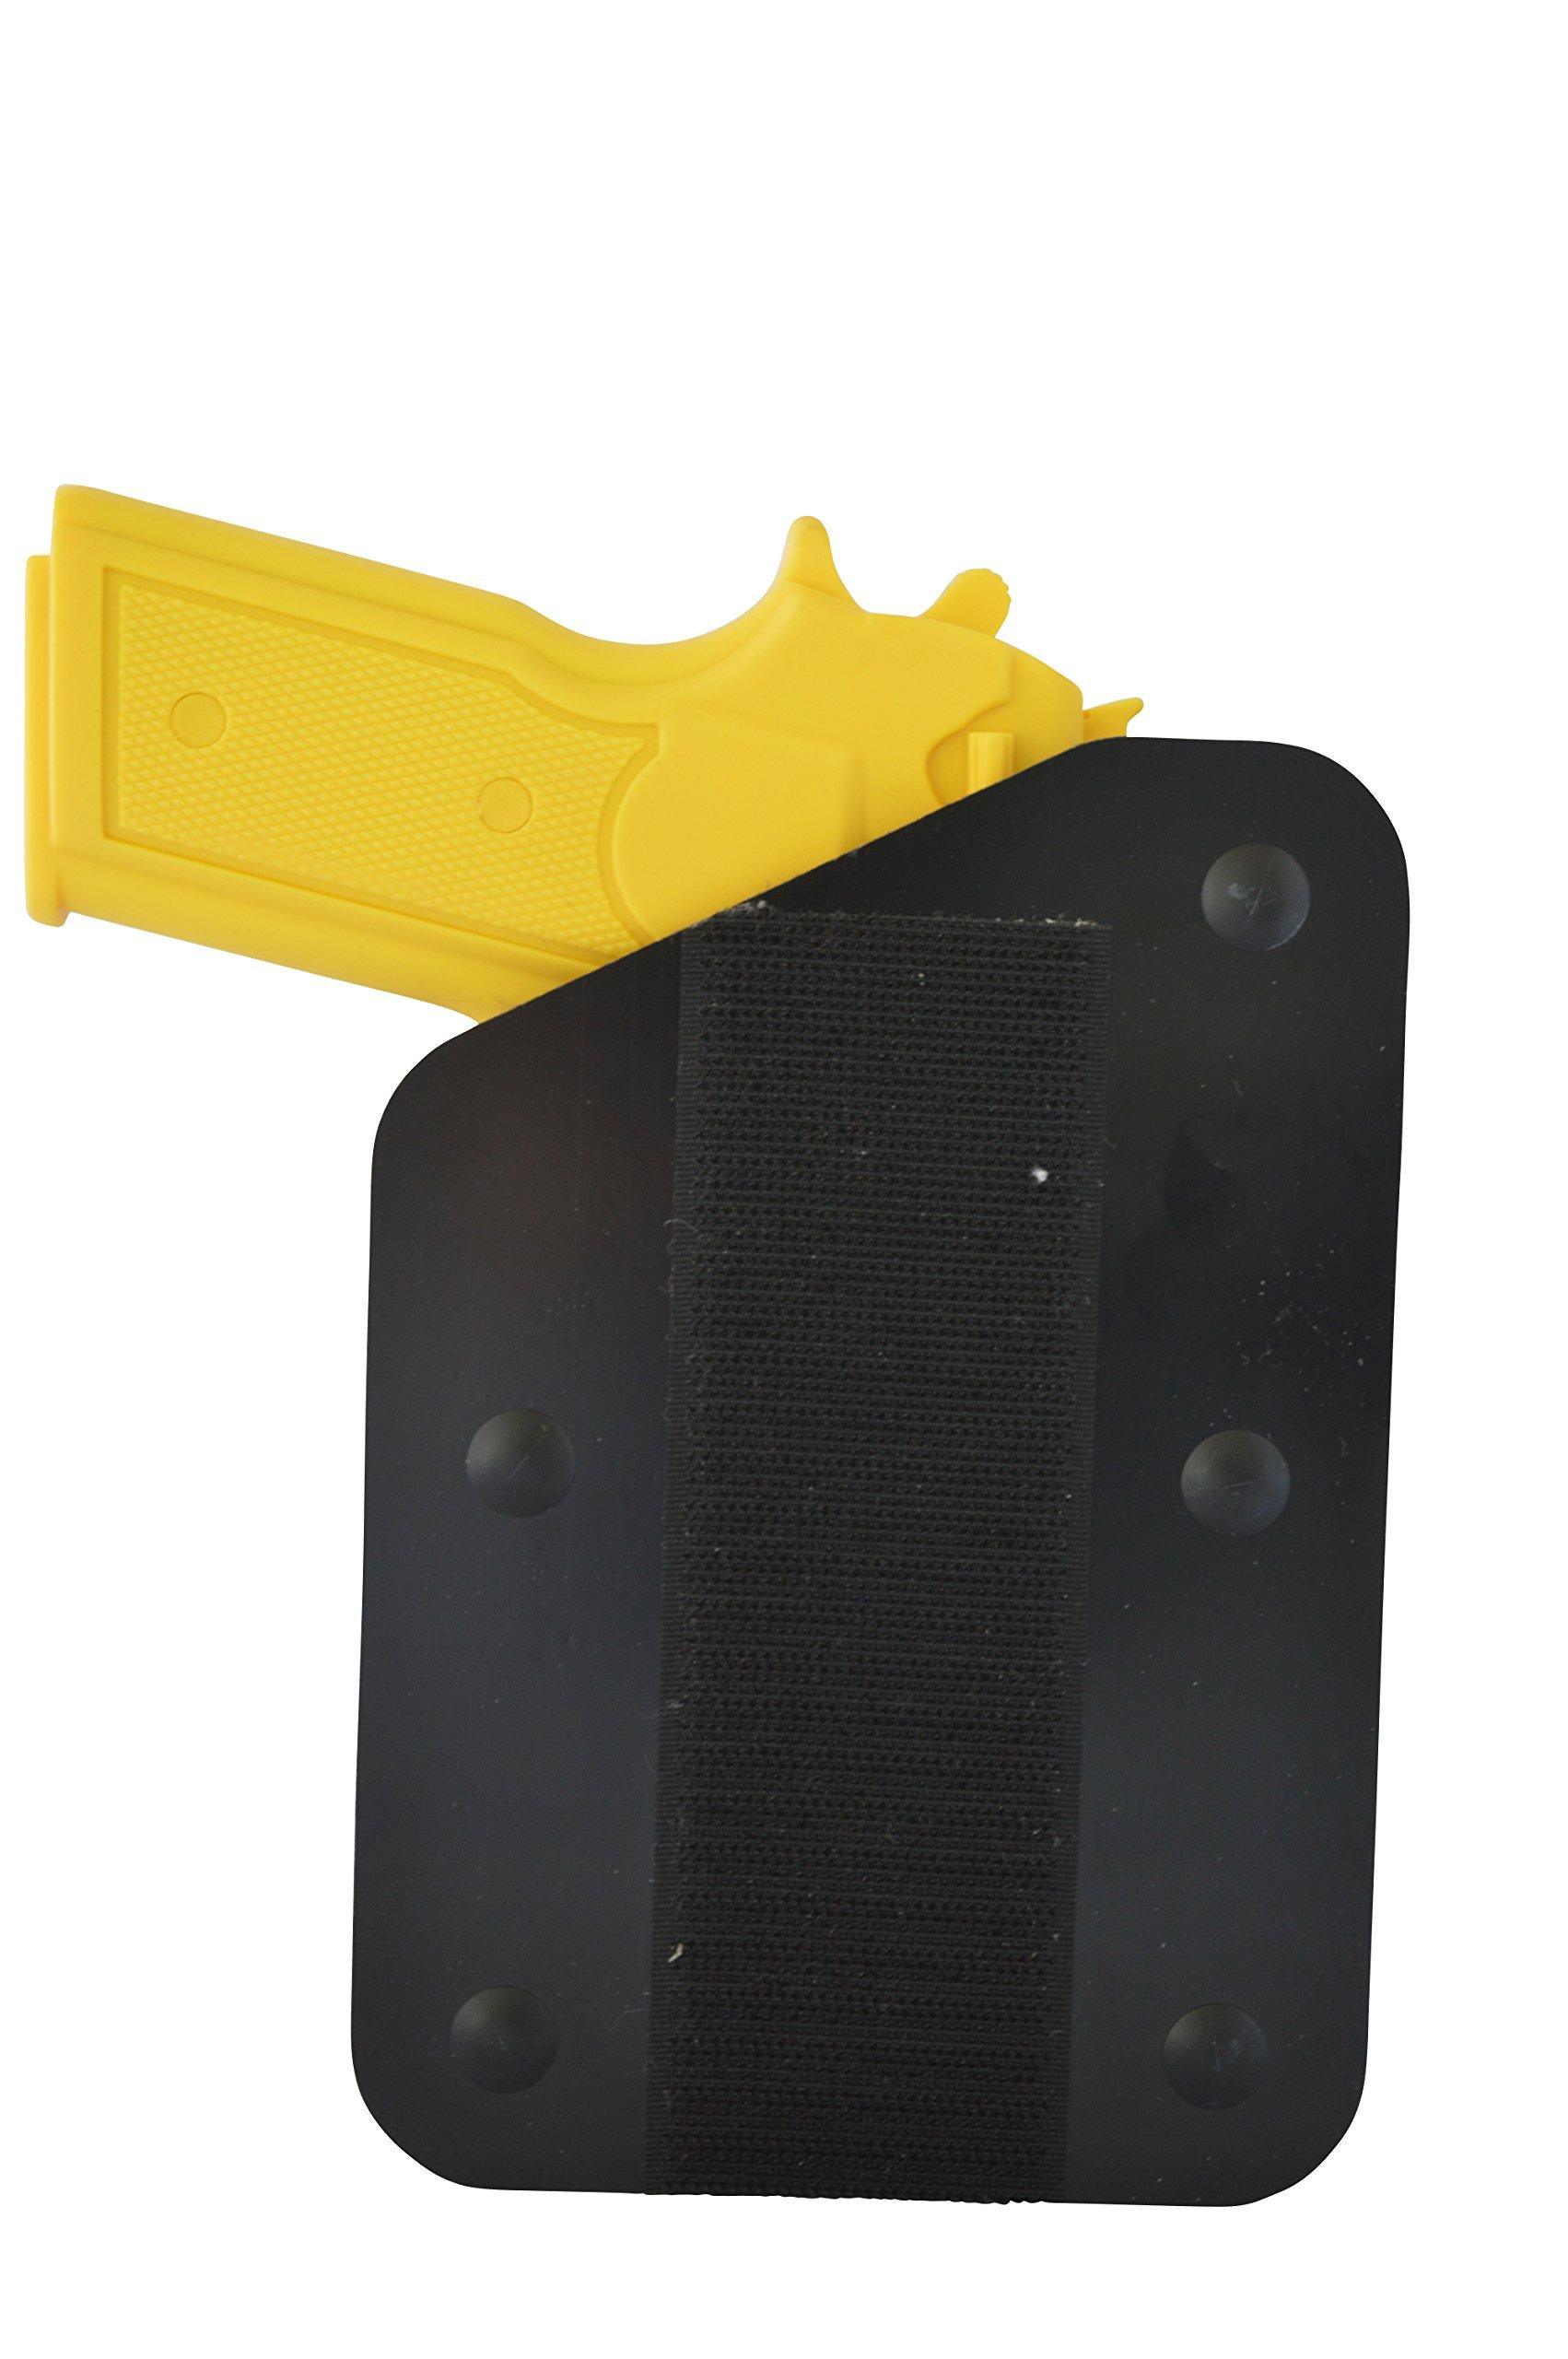 Benchmaster - Weapon Rack - Single (1) Gun Pistol Rack - Left - Velcro Hook - Gun Safe Storage Accessories - Gun Rack